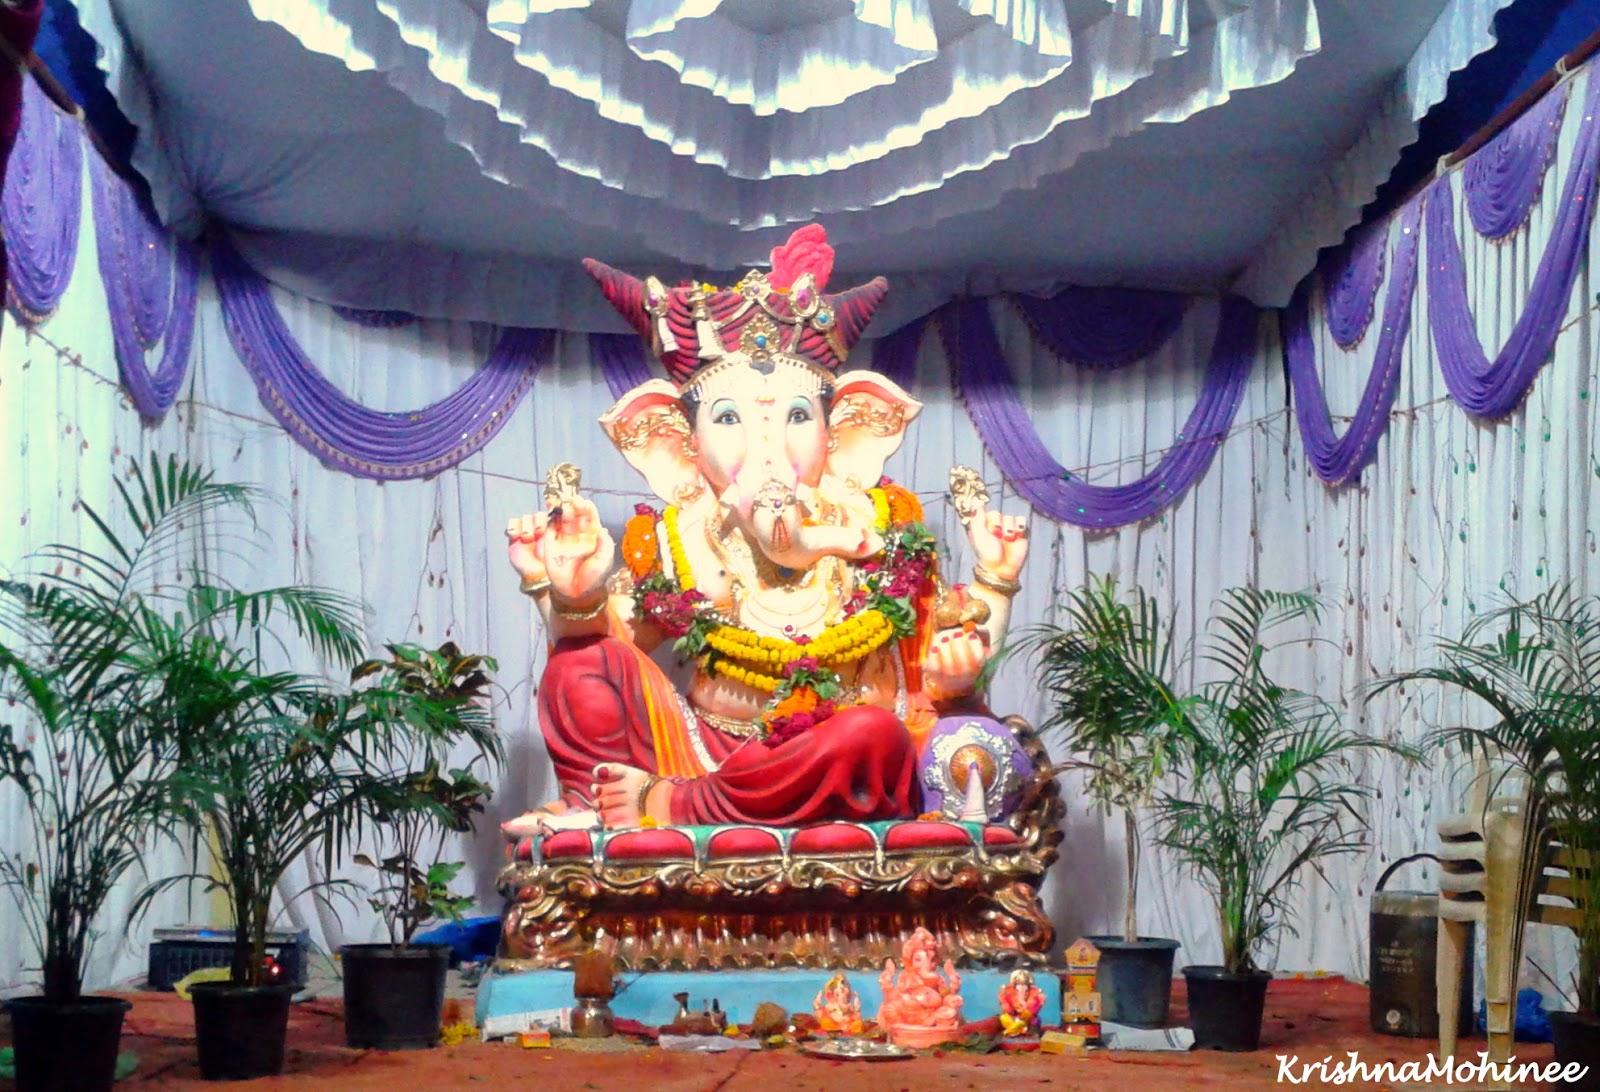 Image: Lord Ganesh Murti